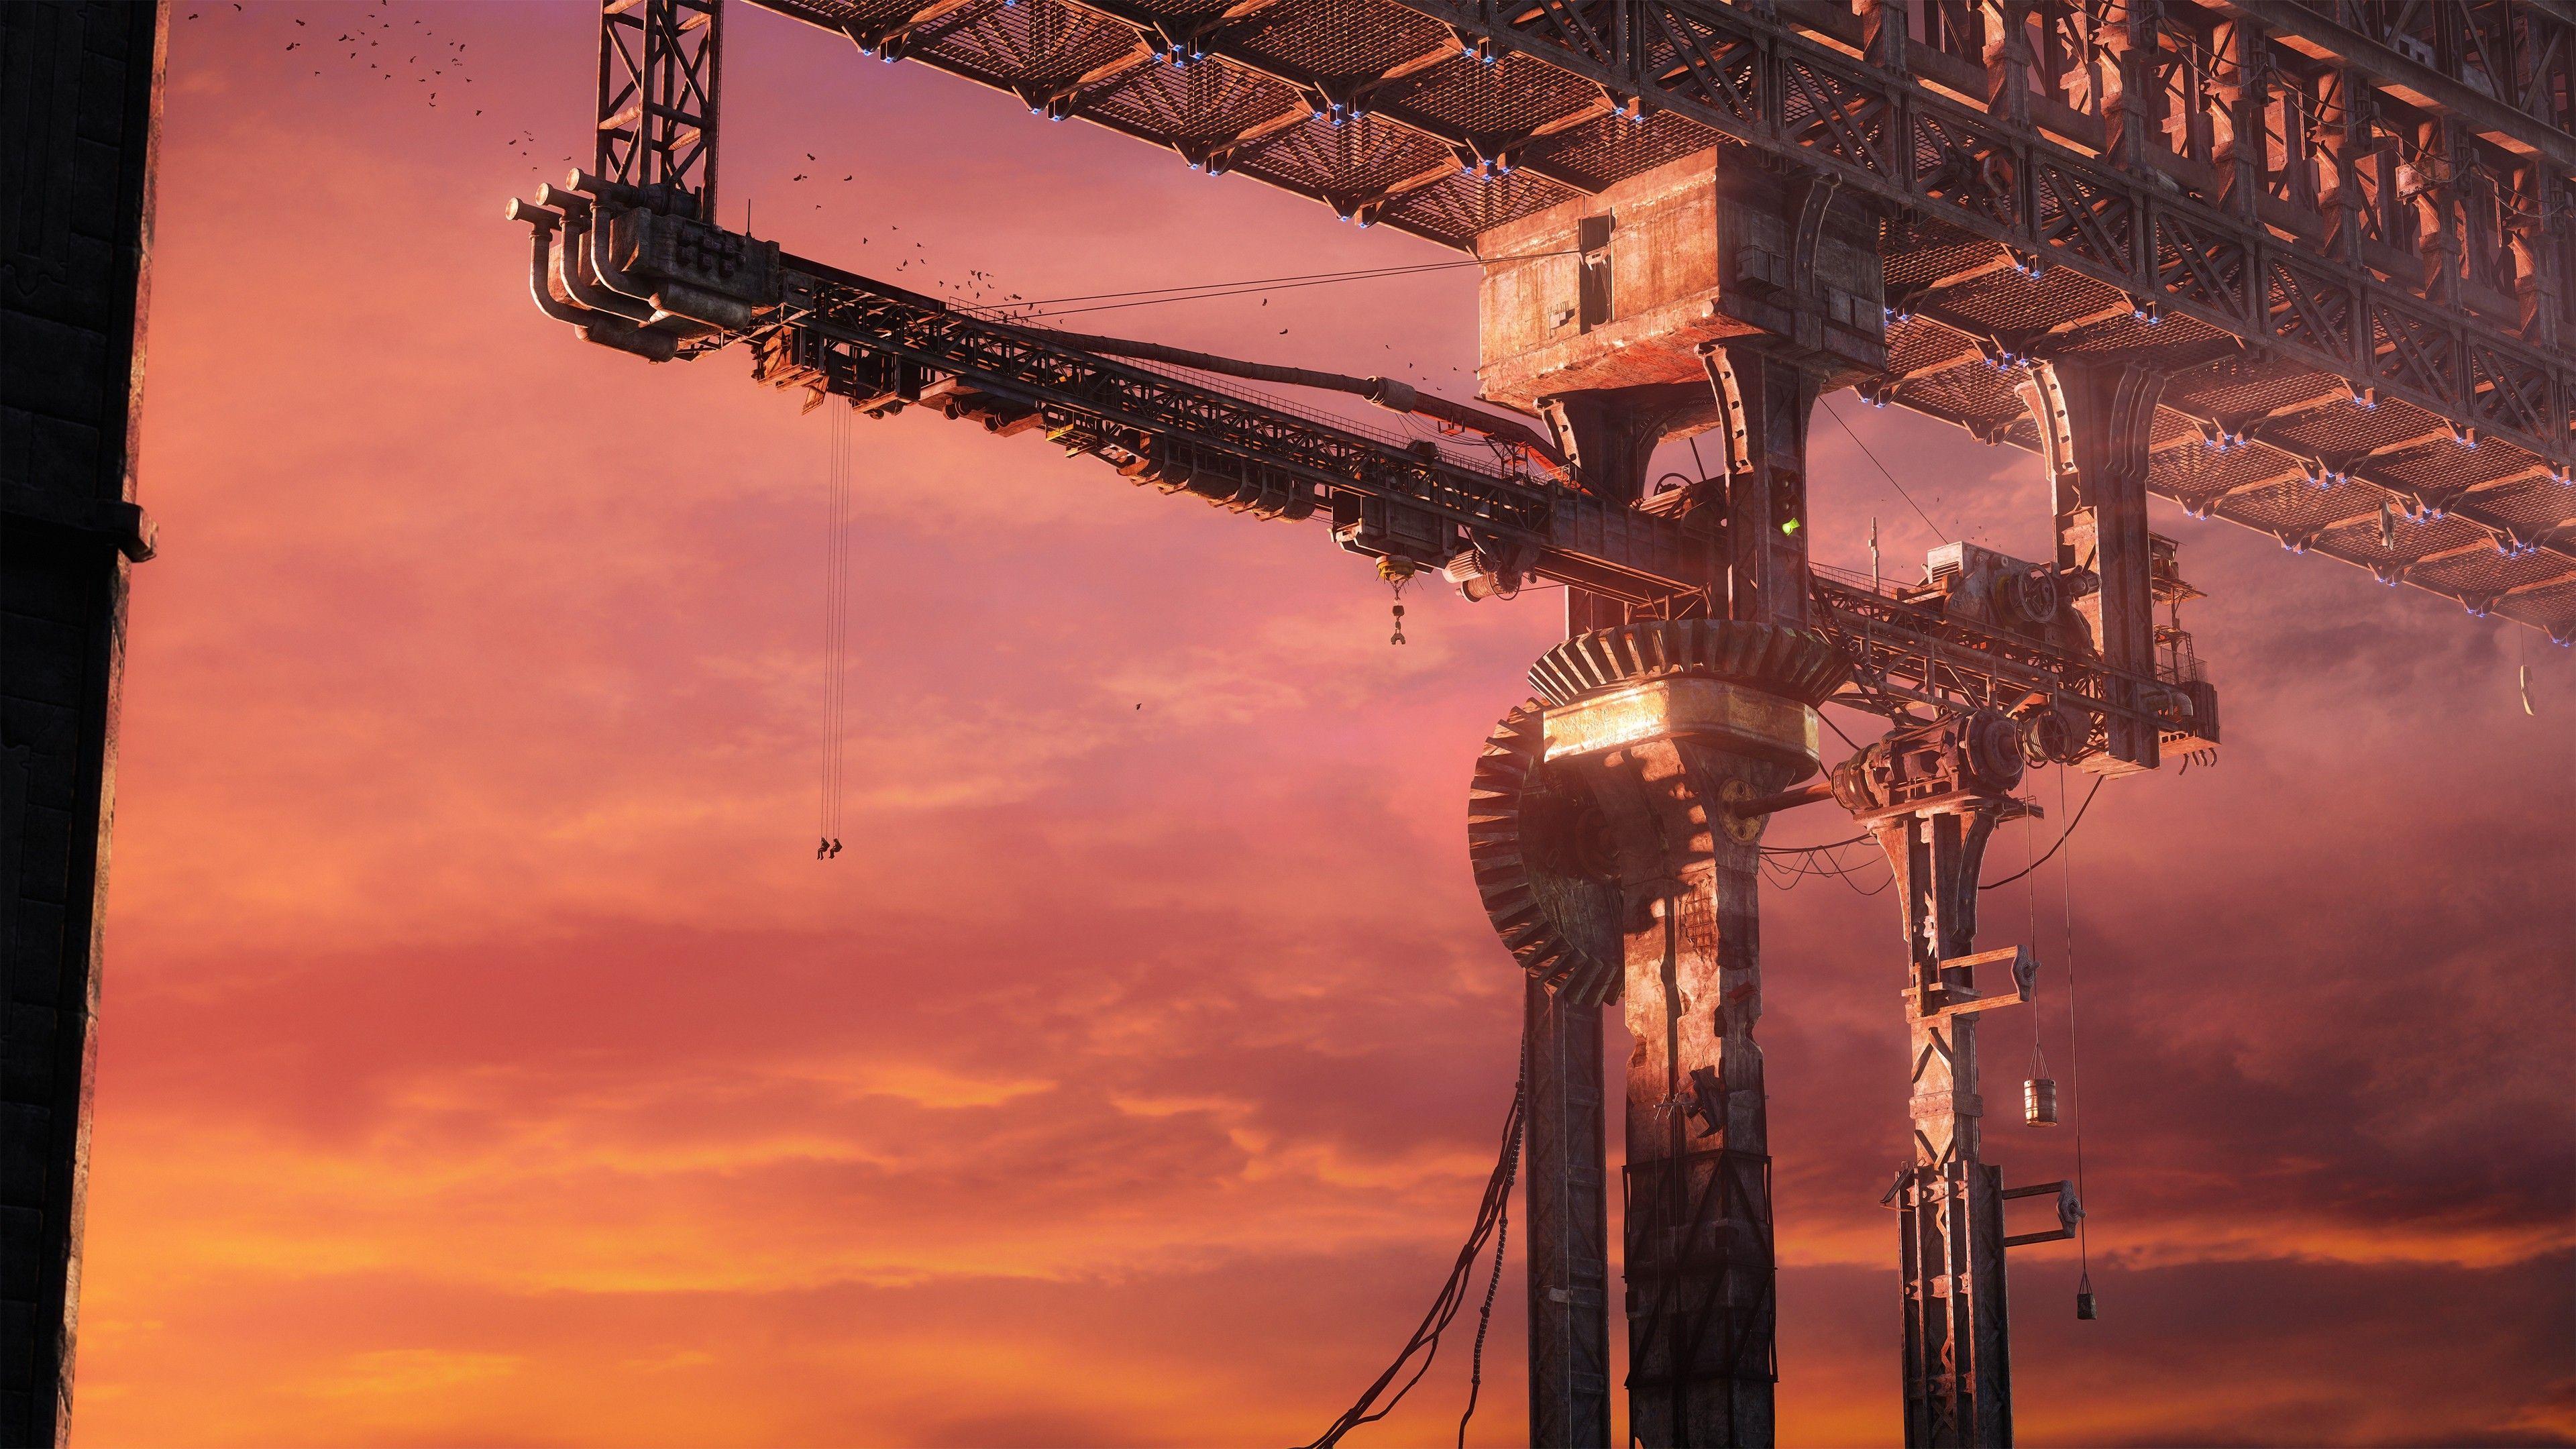 General 3840x2160 Digital Art Garry S Mod Uhd Wallpaper Futuristic City Crane Construction